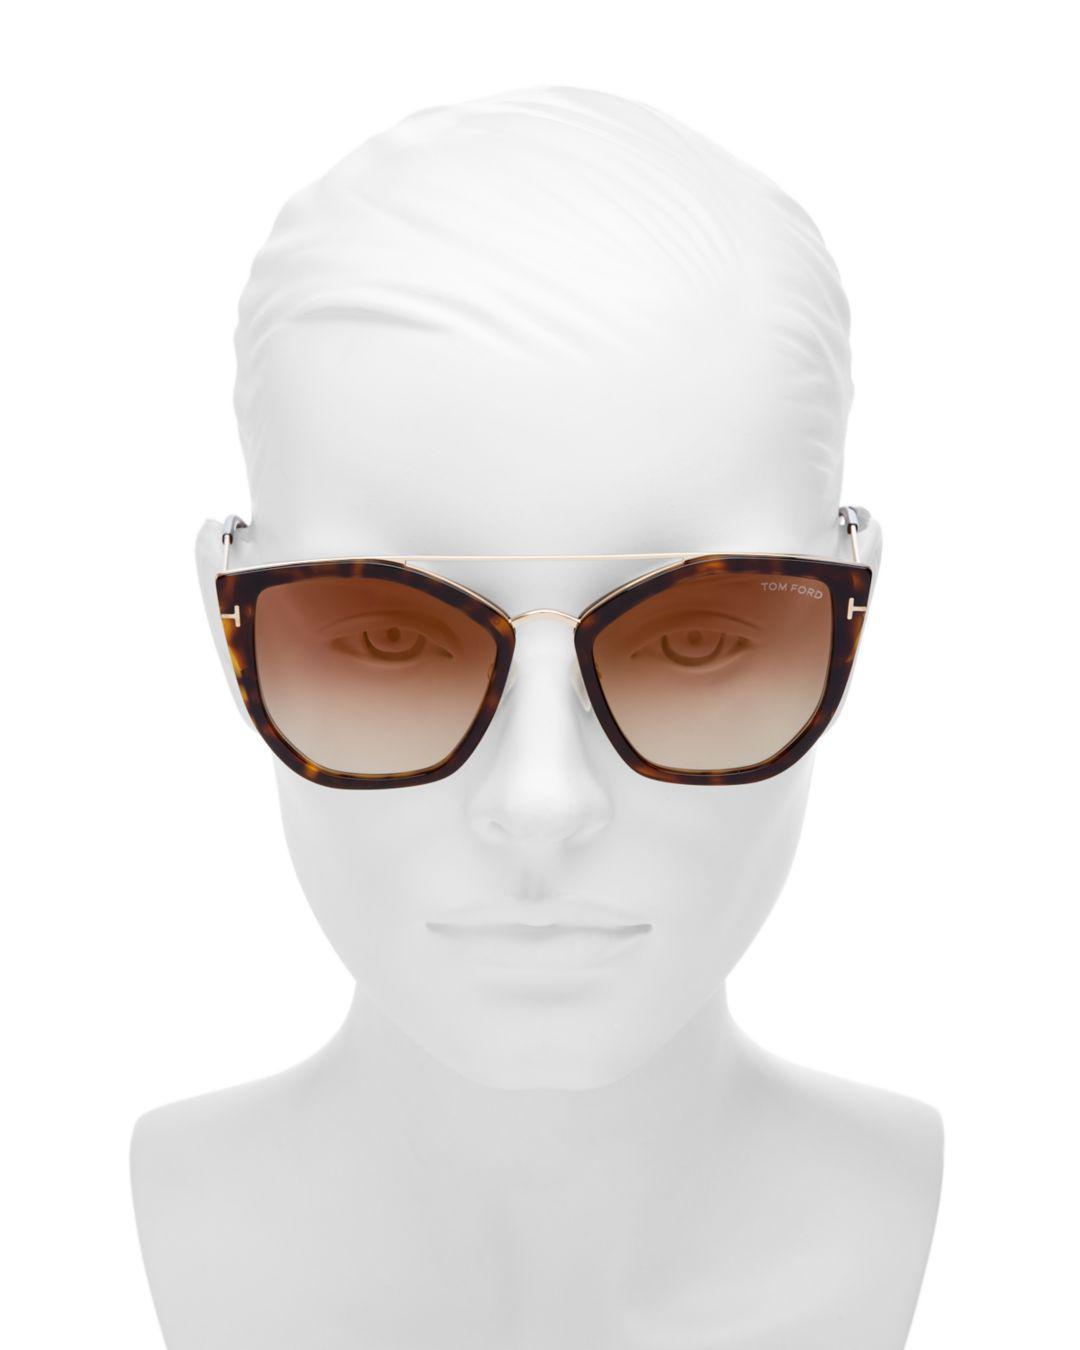 487ecfa4824 Lyst - Tom Ford Women s Cat Eye Mirrored Sunglasses 55mm in Brown